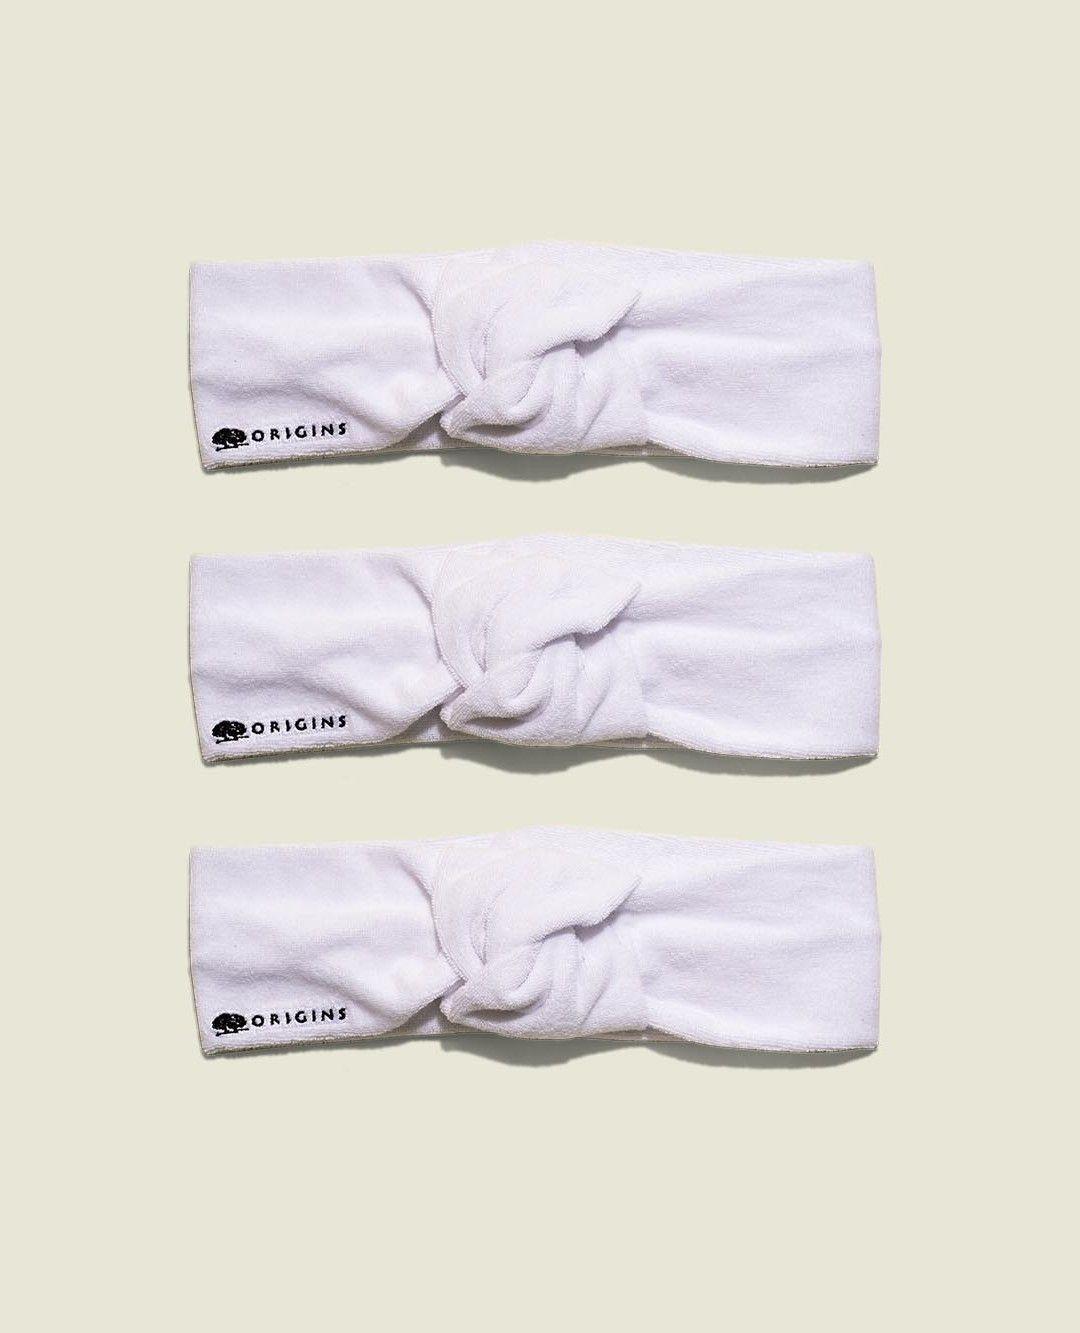 Terrycloth headbands